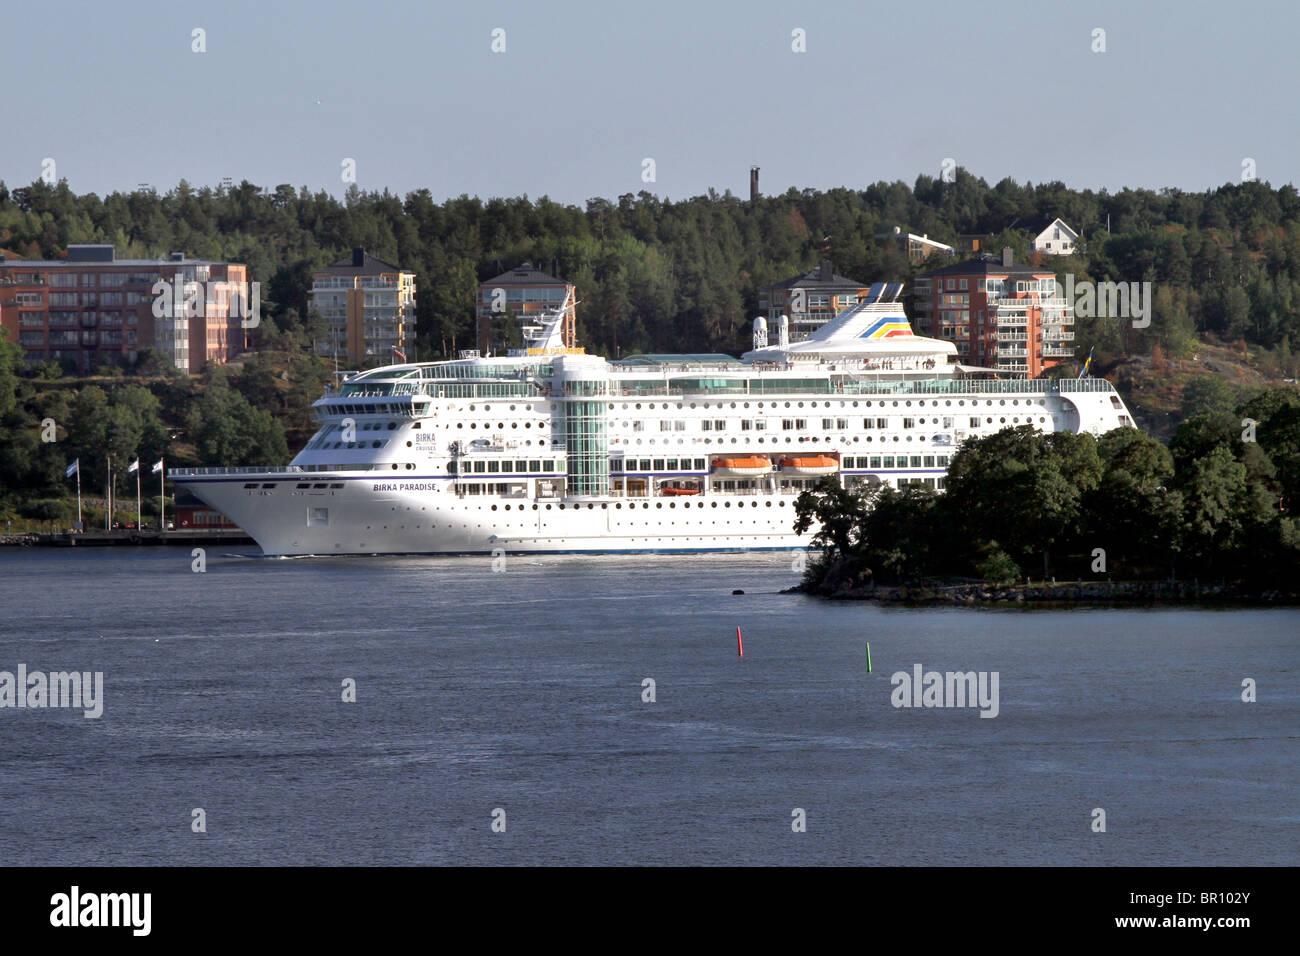 Birka Paradise Cruise Ship in the Stockholm Archipelago in Stockholm, Sweden - Stock Image